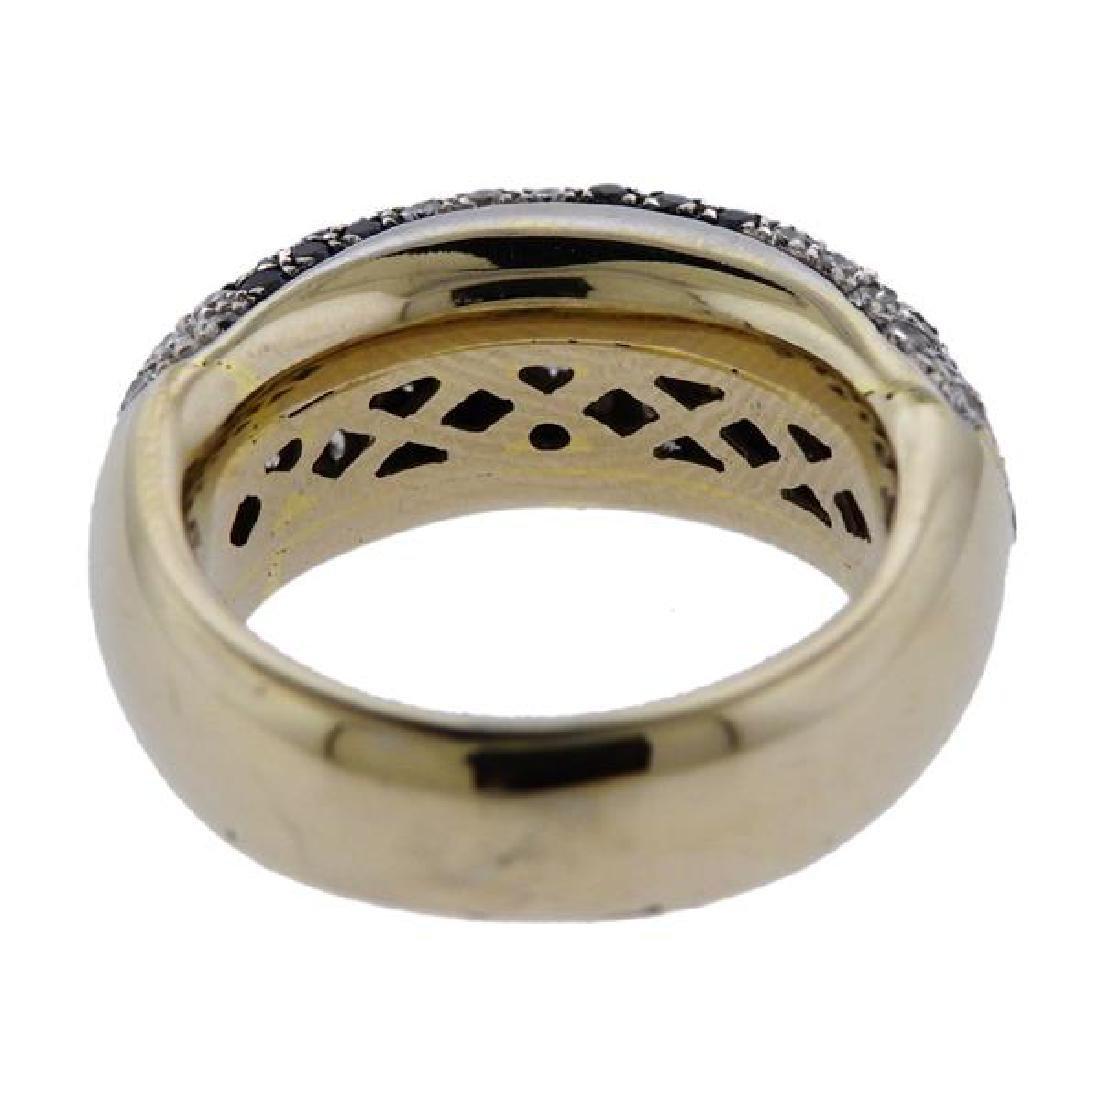 18K Gold Black White Diamond Band Ring - 3